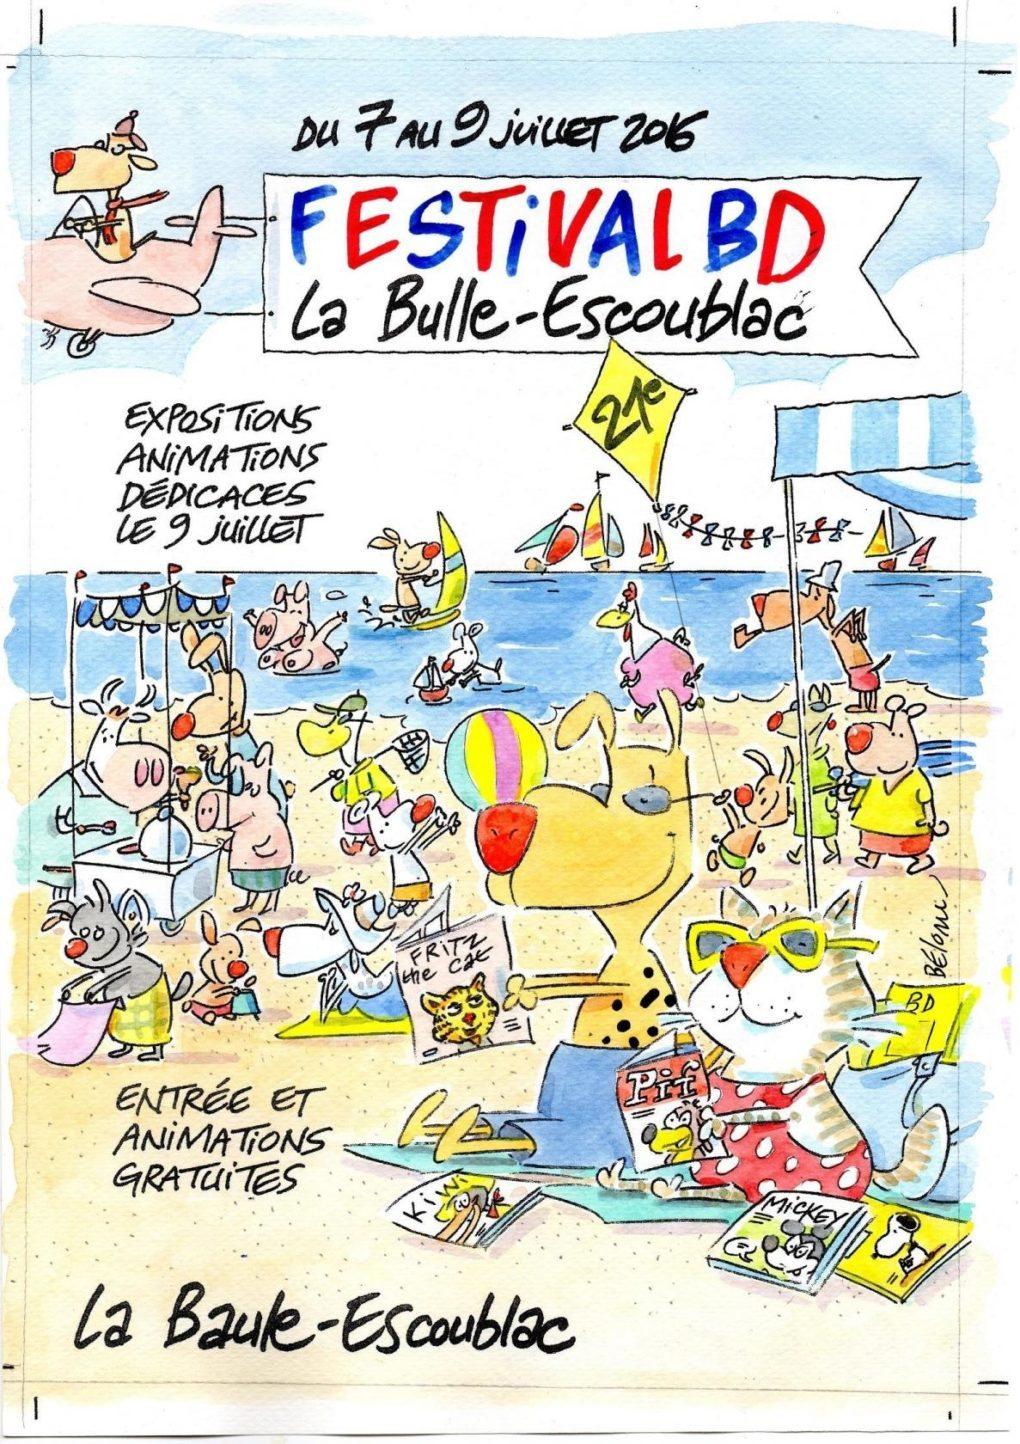 21e festival BD La Bulle-Escoublac La Baule-Escoublac